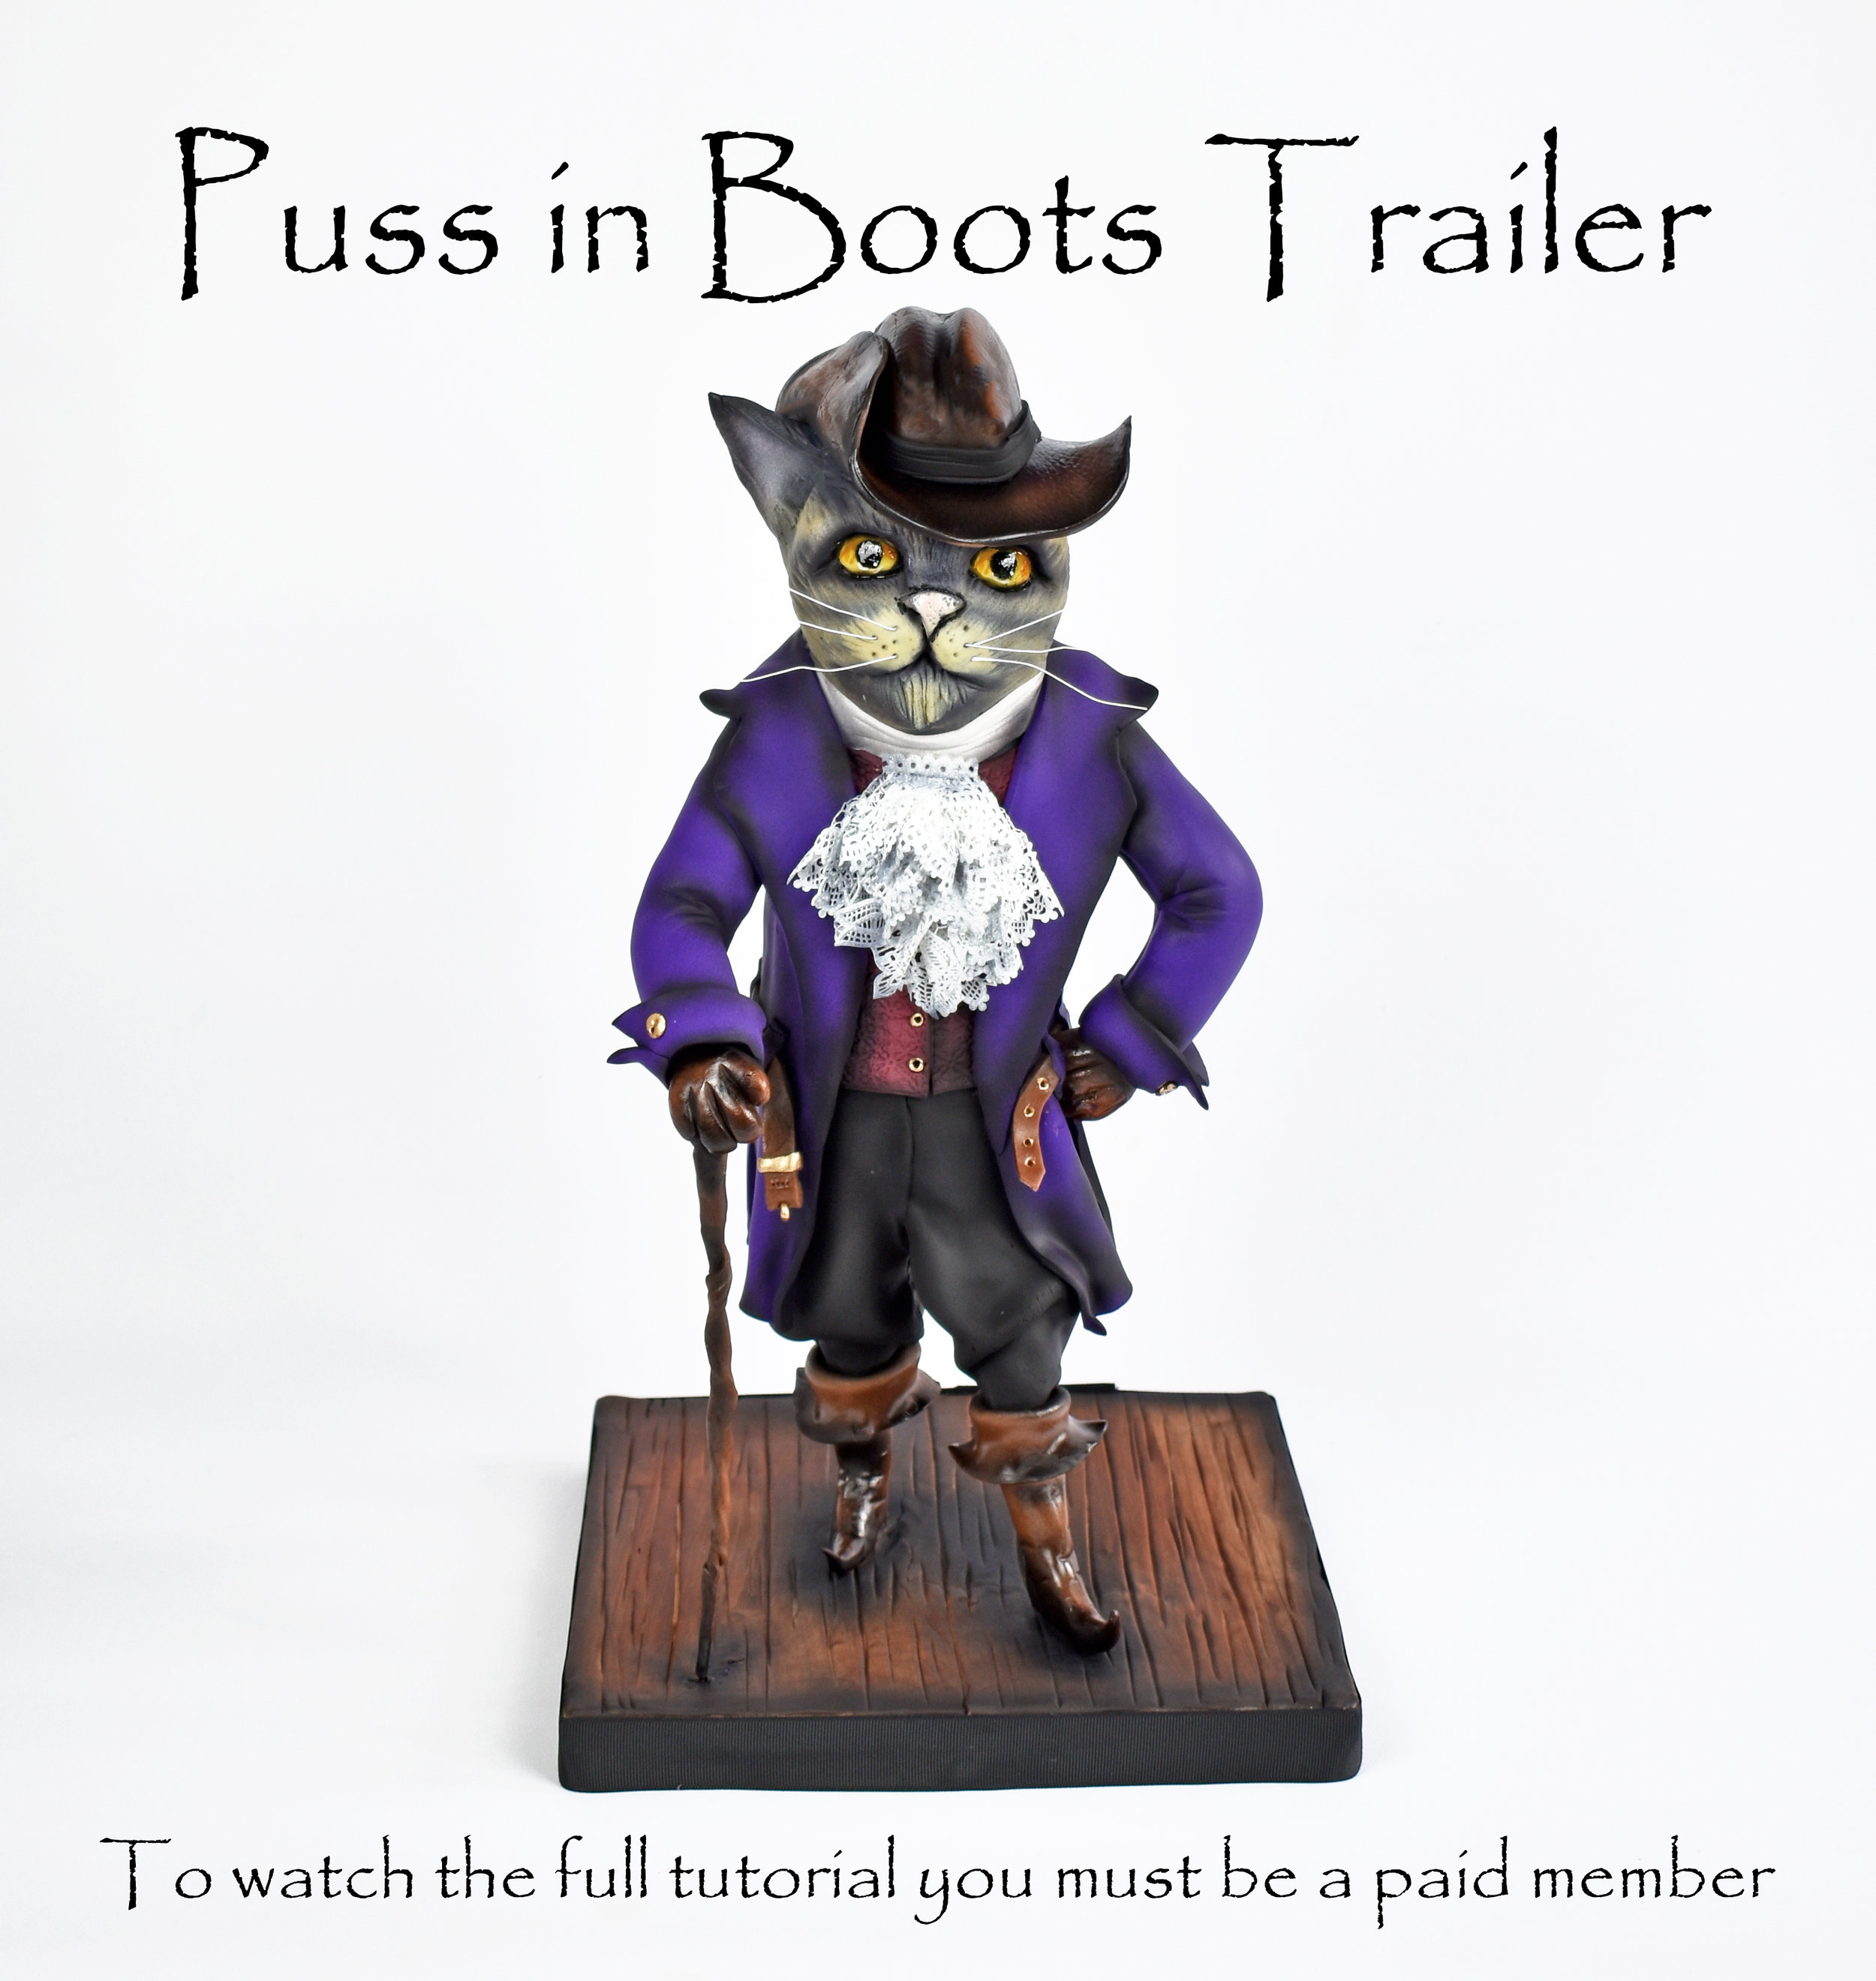 puss in boots trailer.jpg